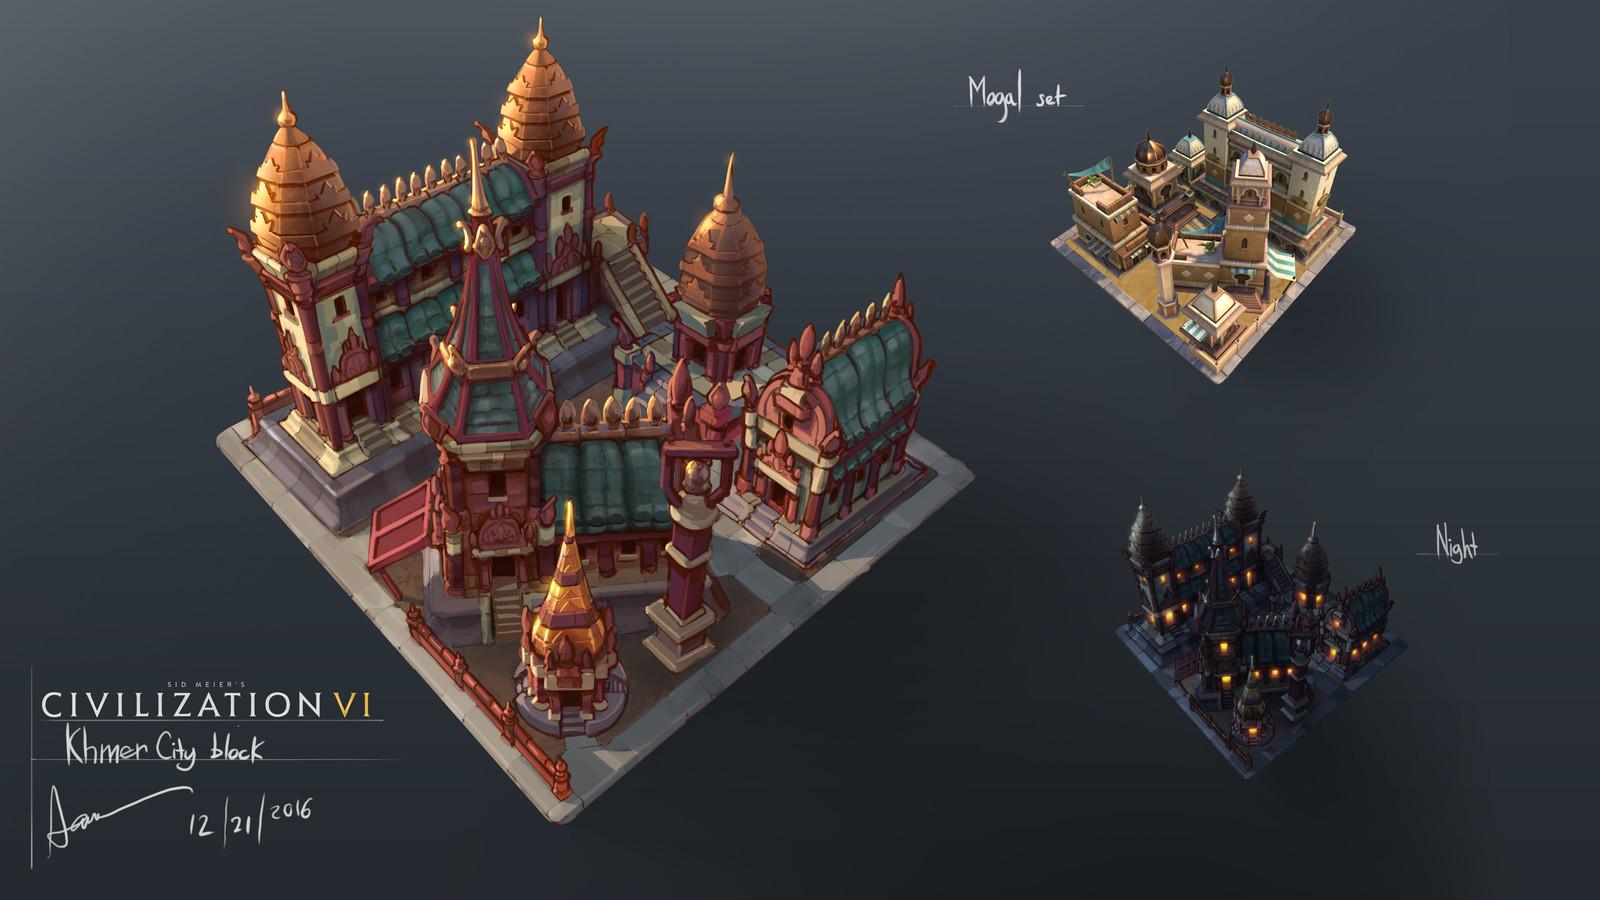 Khmer City Block